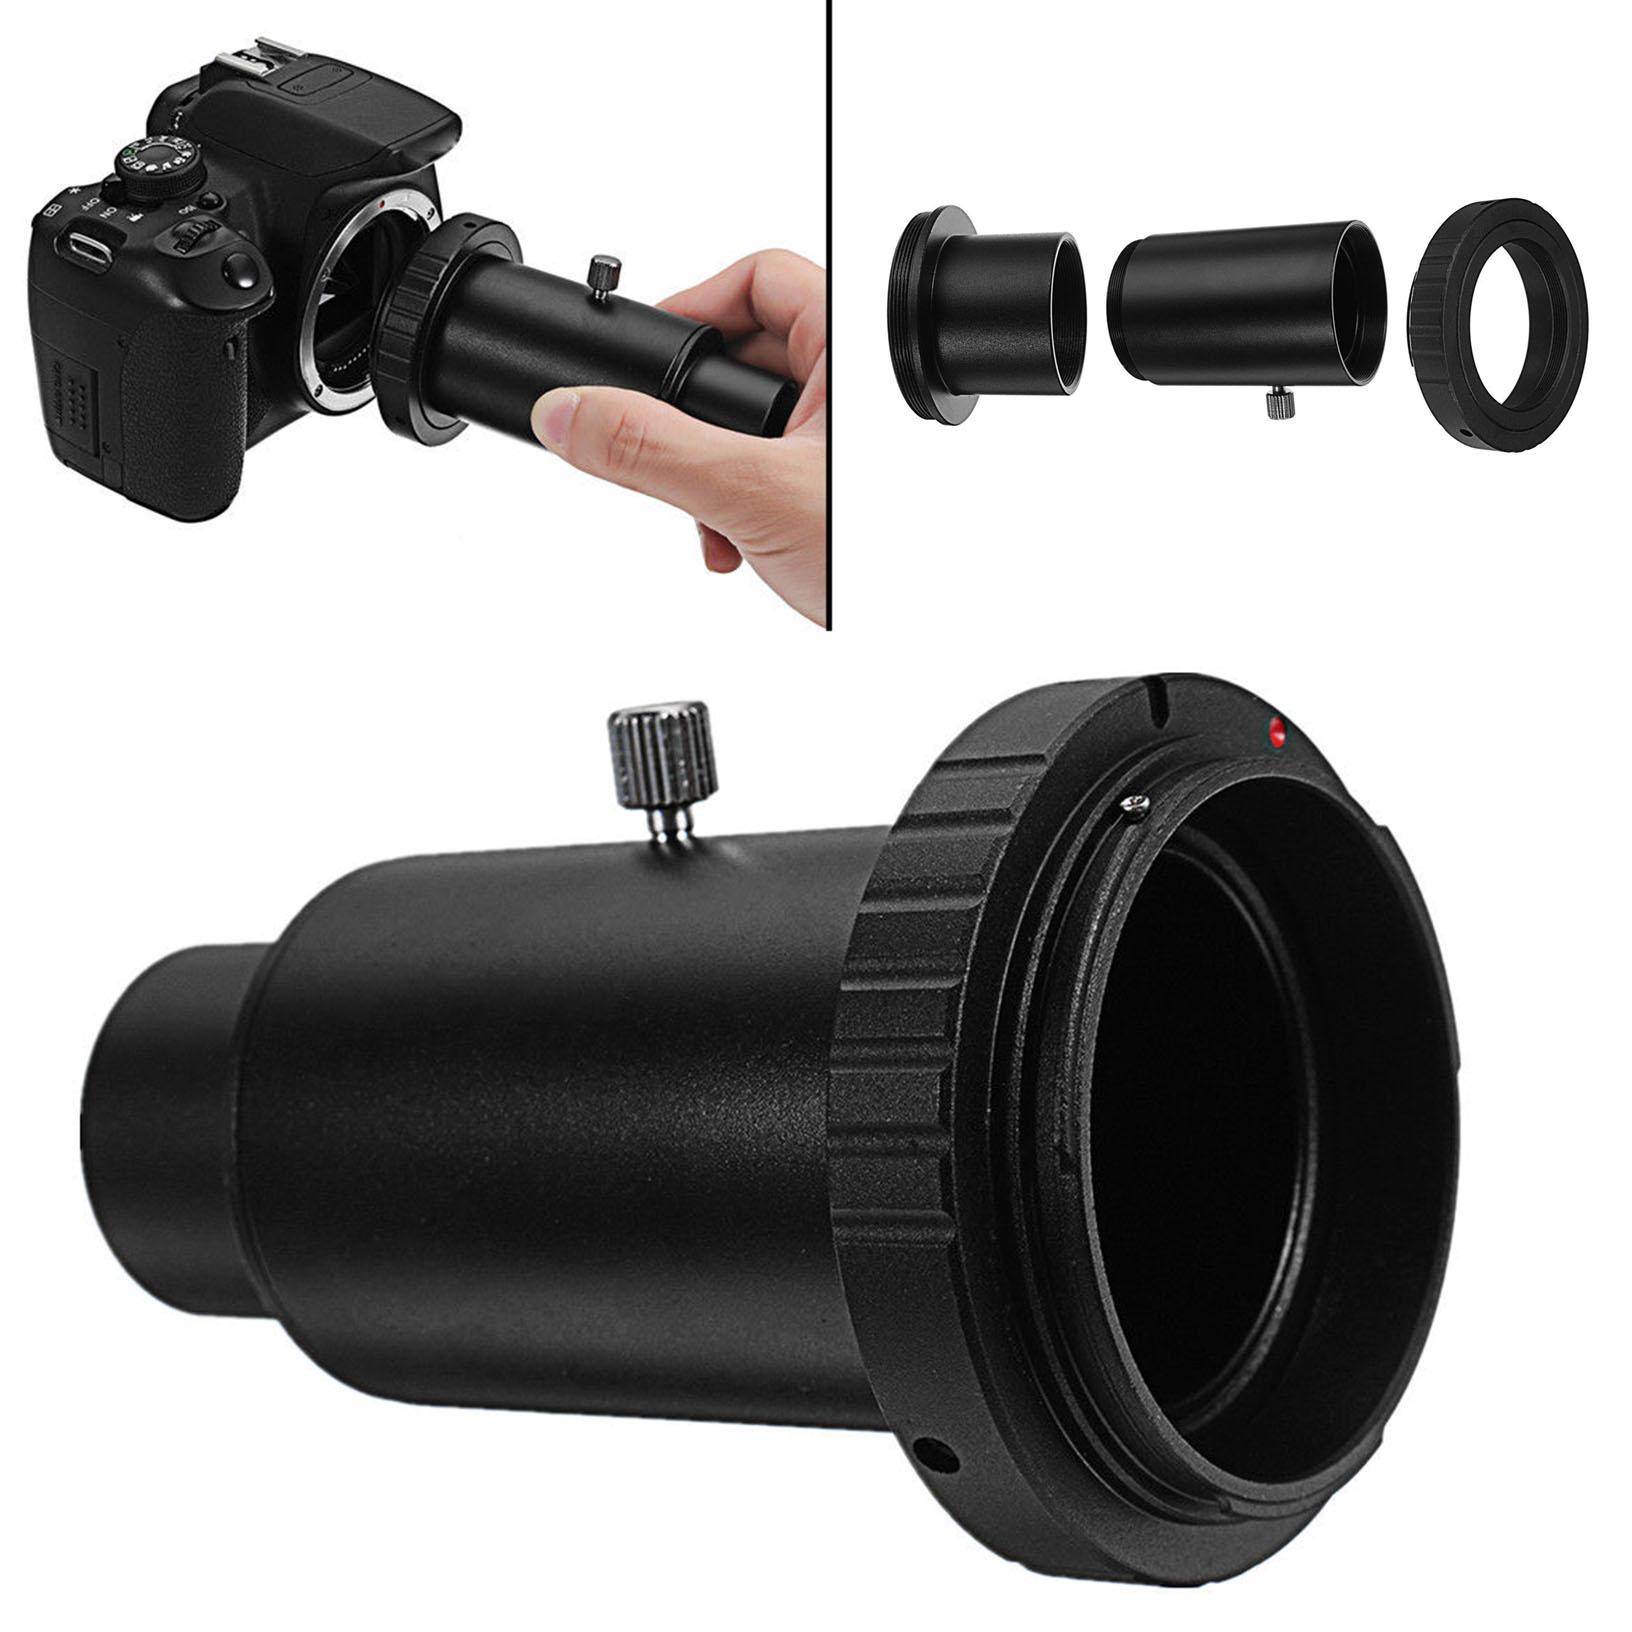 Aluminum T2 Adapter Telescope Extension Tube 1.25 inch Telescope Mount Adapter Thread T-Ring for Pentax PK-Mount Lens Camera